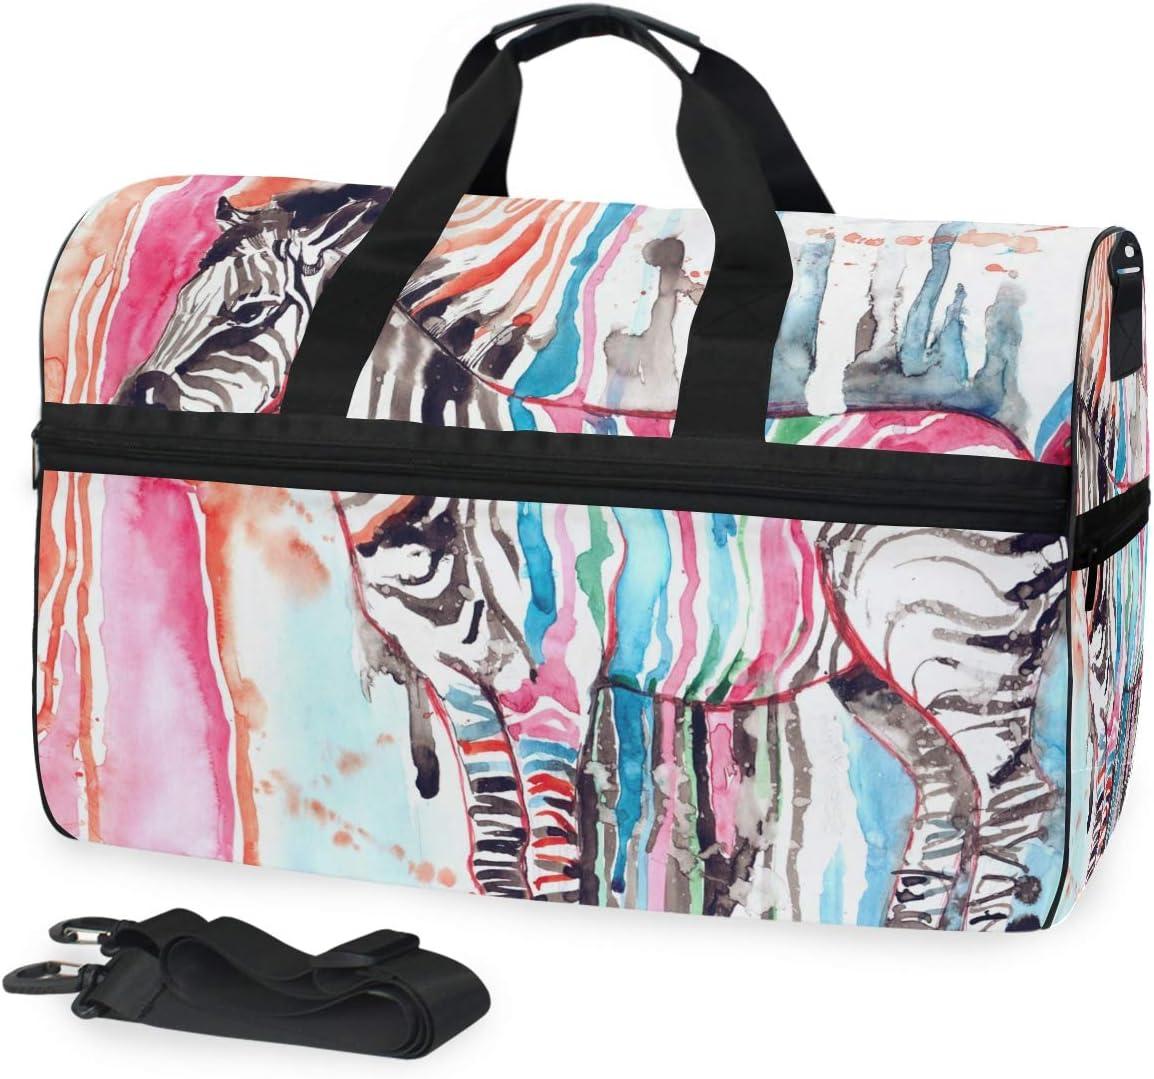 Travel Duffels Zebra Watercolor Duffle Bag Luggage Sports Gym for Women /& Men